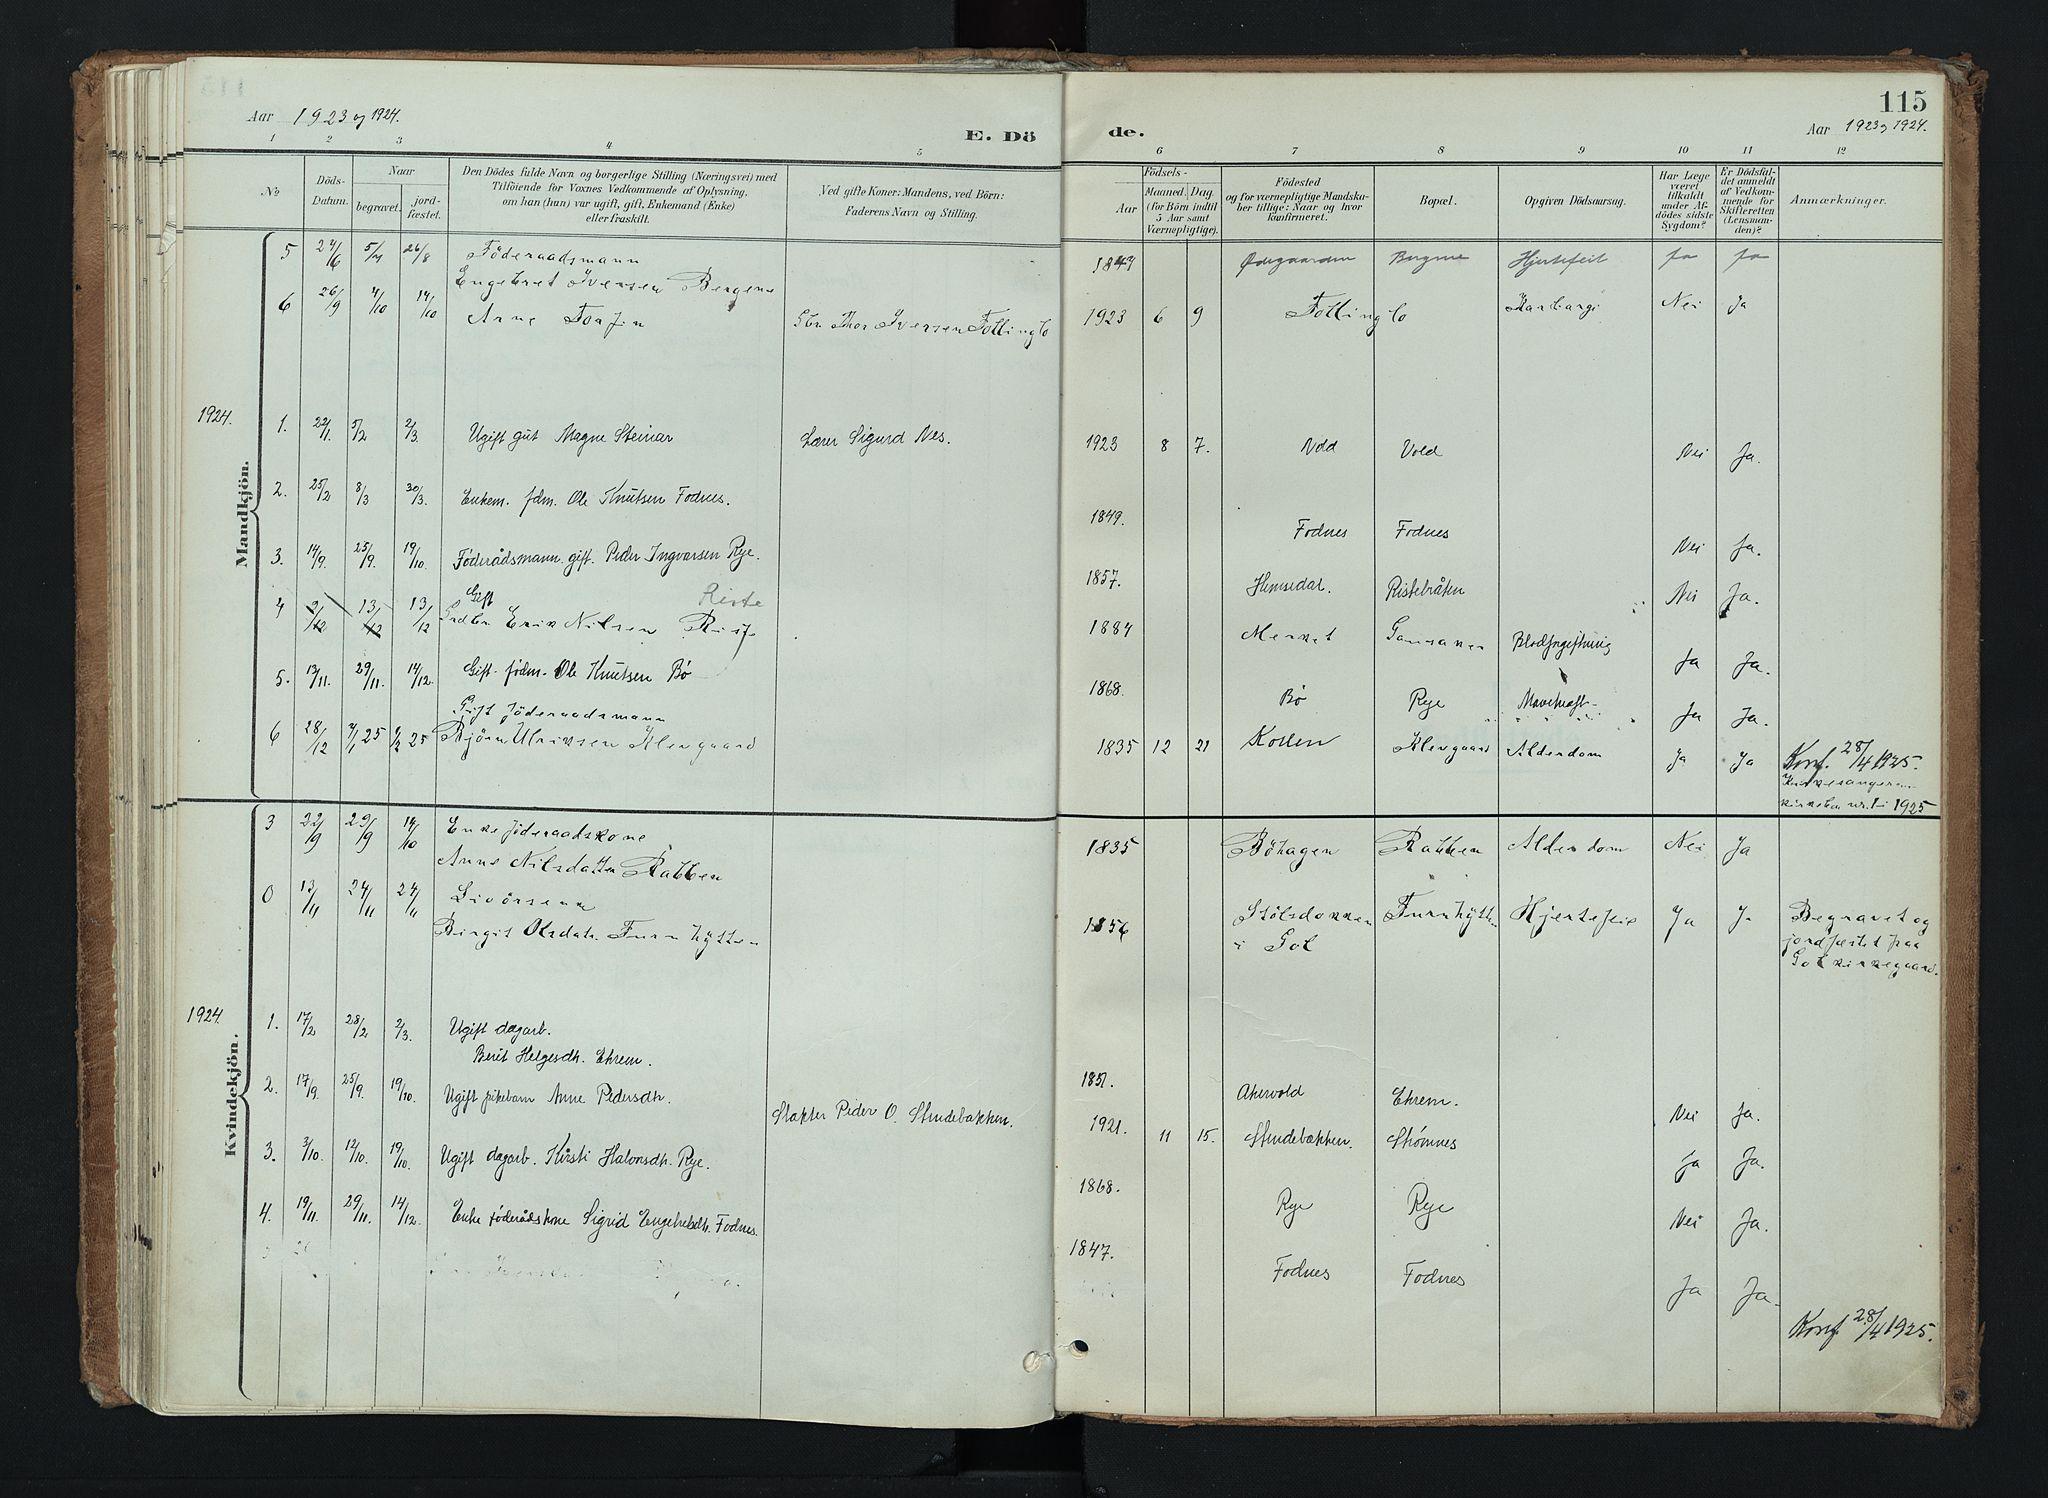 SAH, Nord-Aurdal prestekontor, Ministerialbok nr. 16, 1897-1925, s. 115